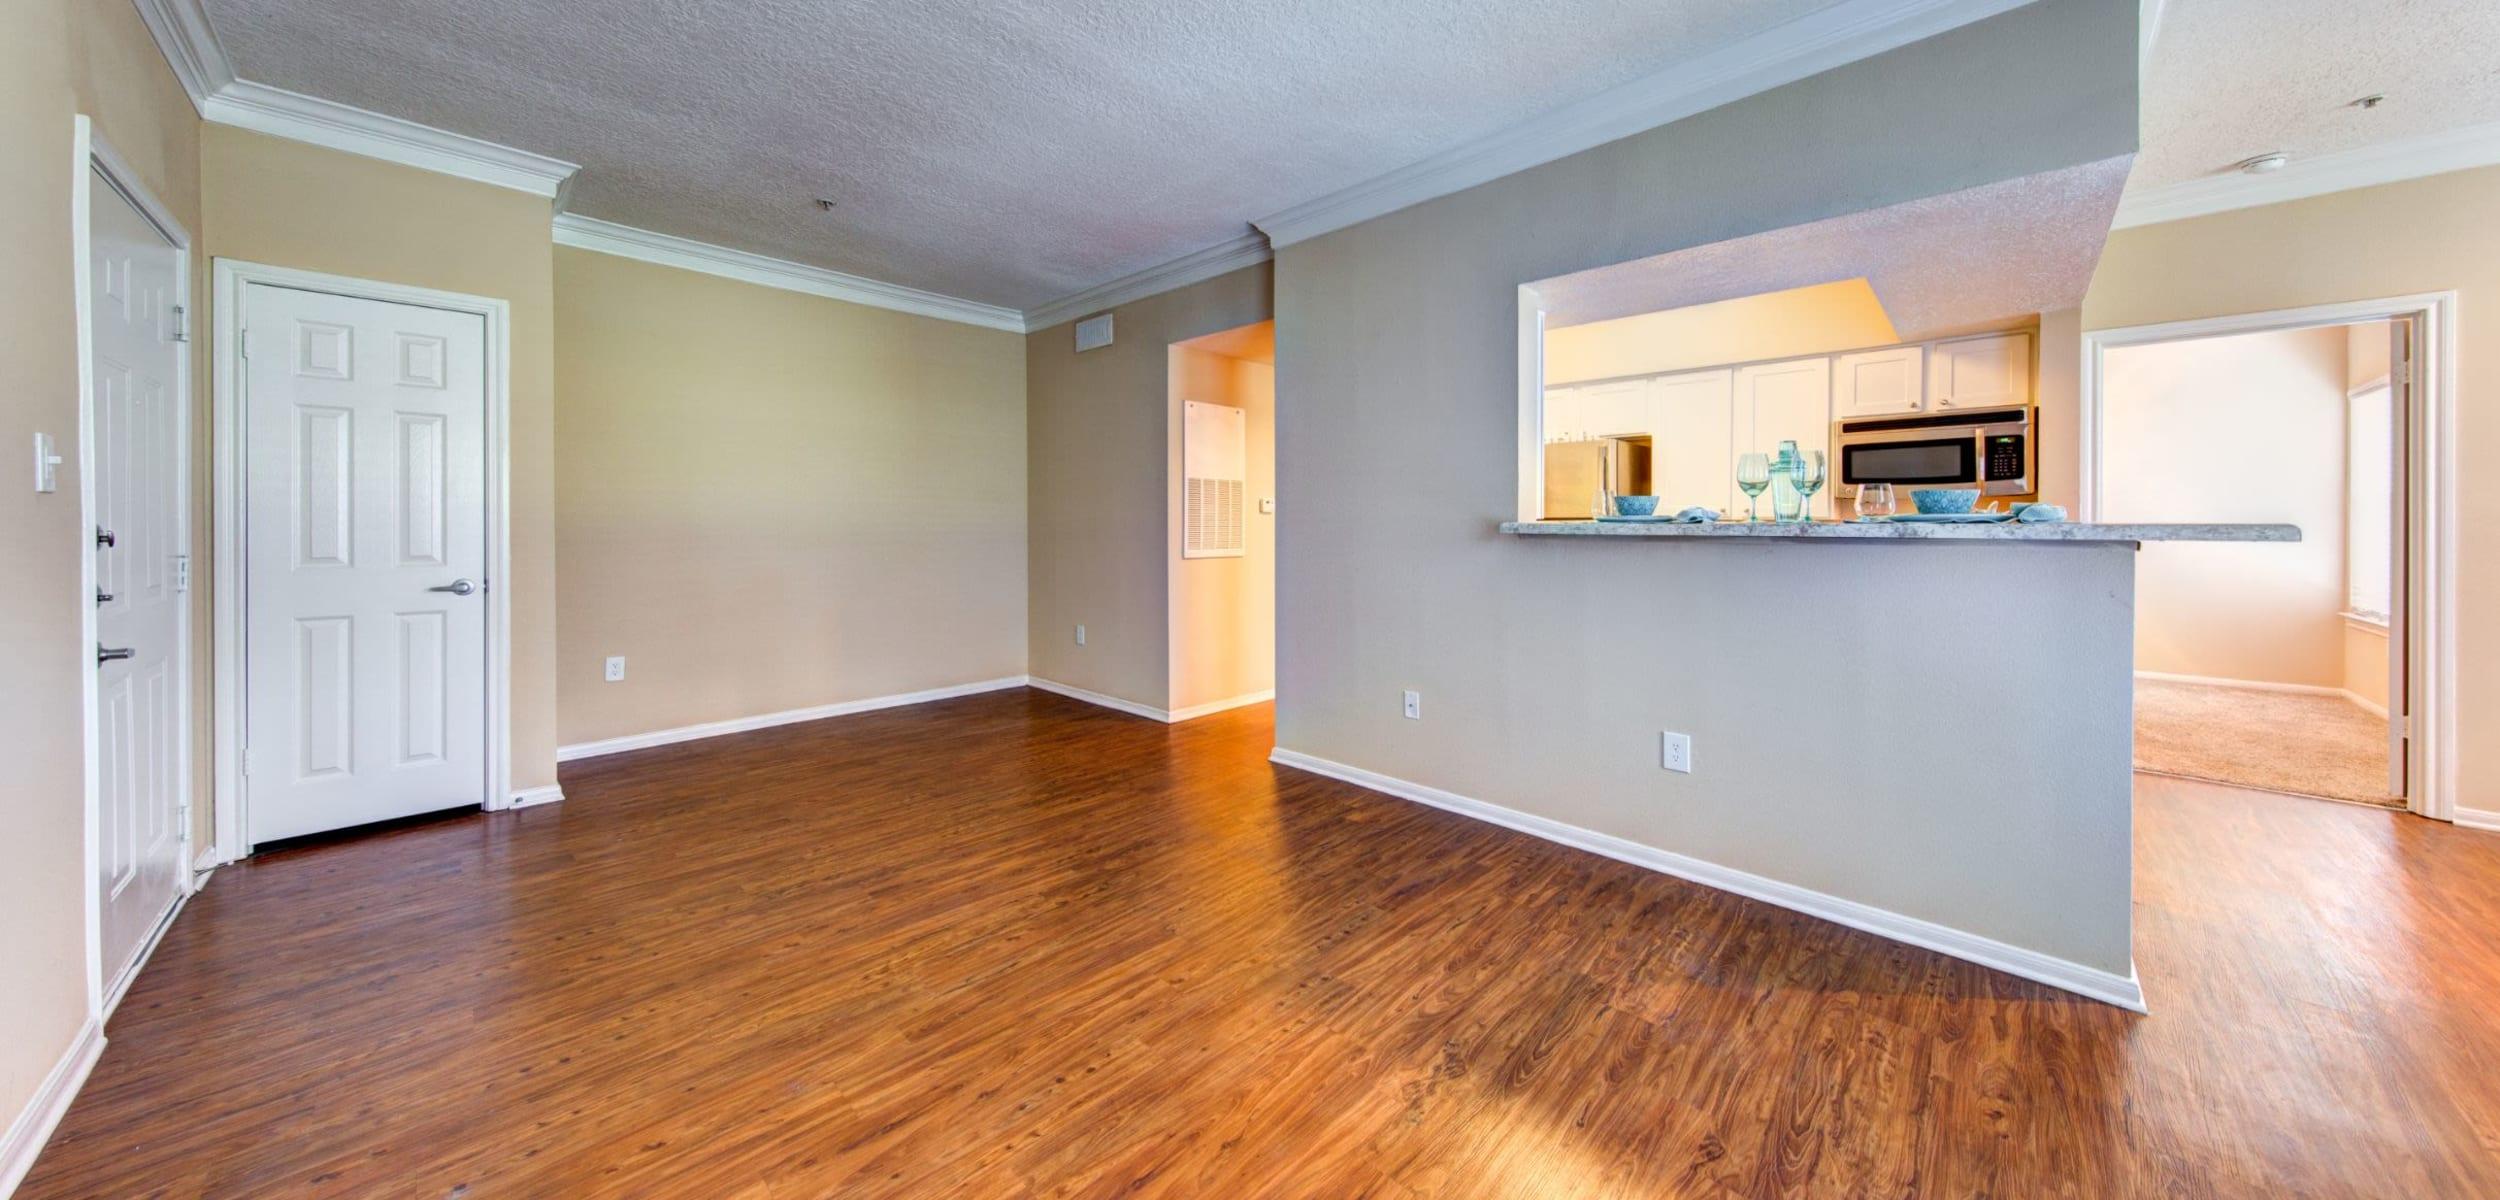 Living space at Marquis at Silverton in Cary, North Carolina